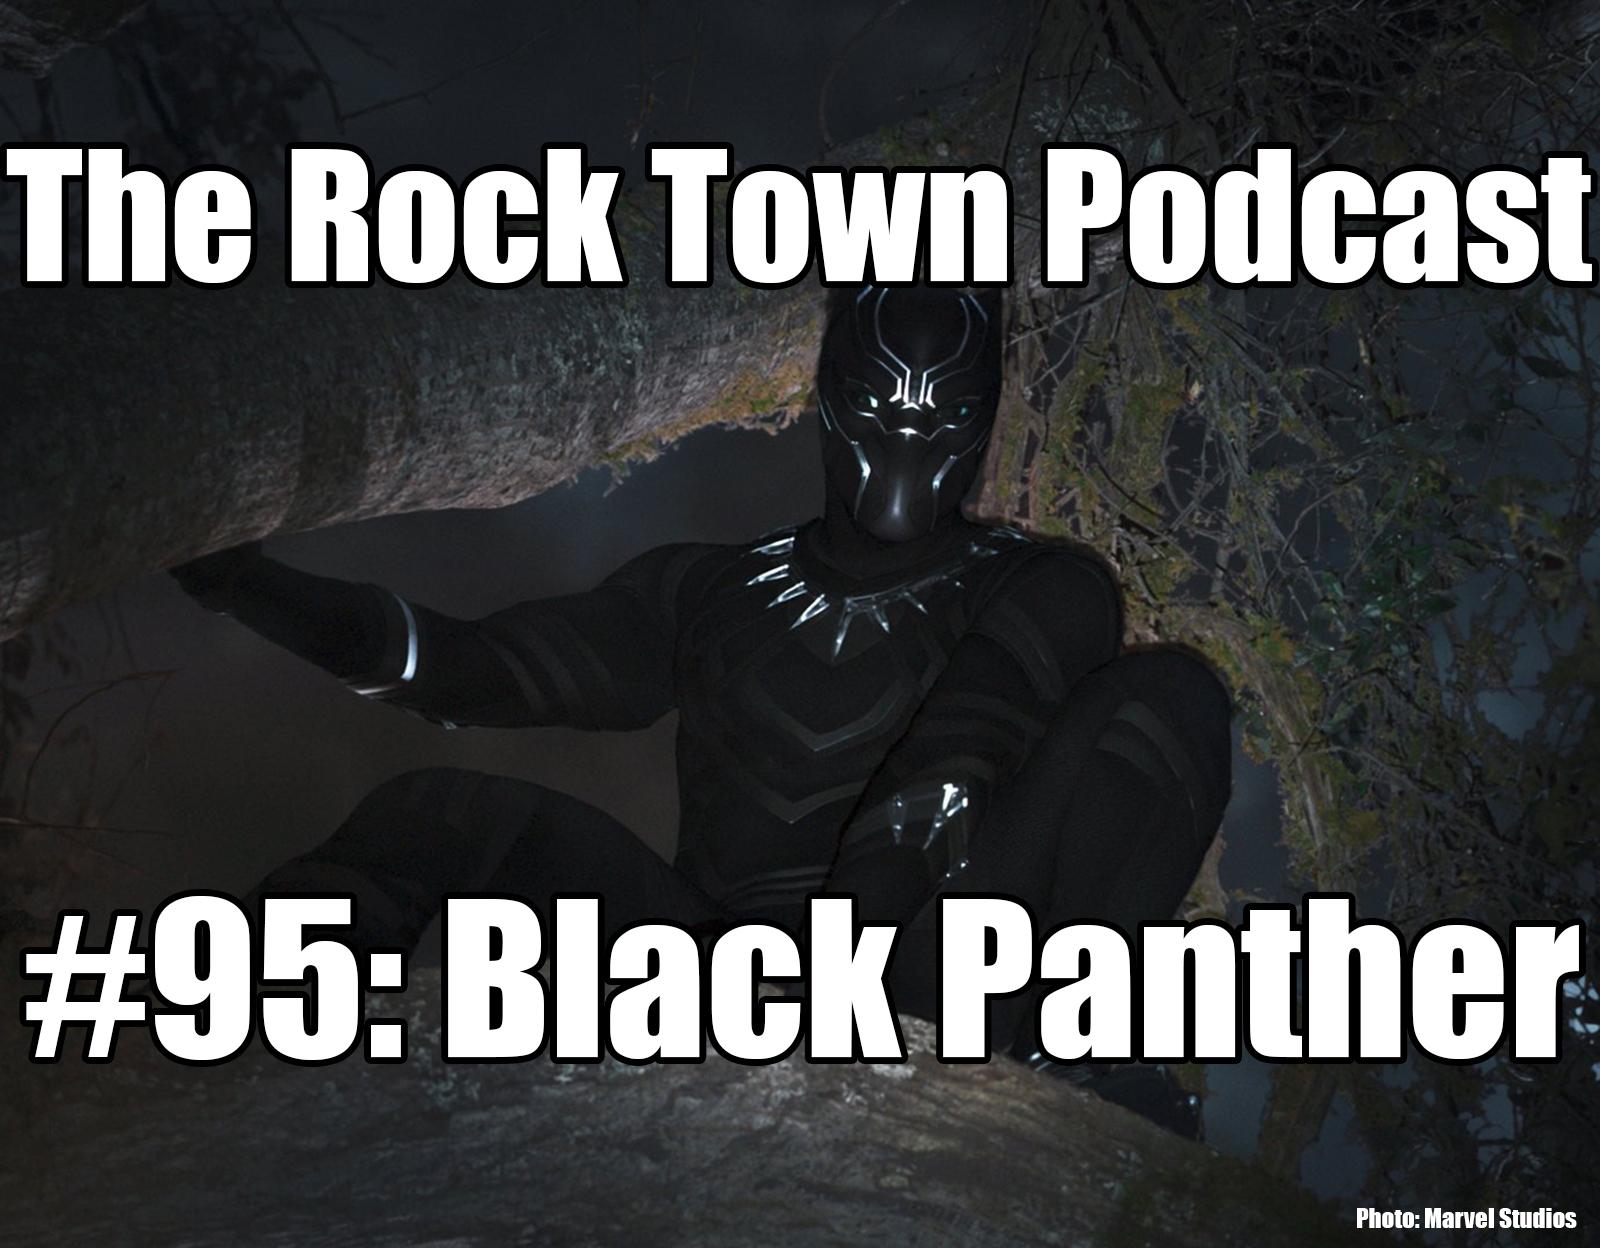 BlackPantherTHUMB